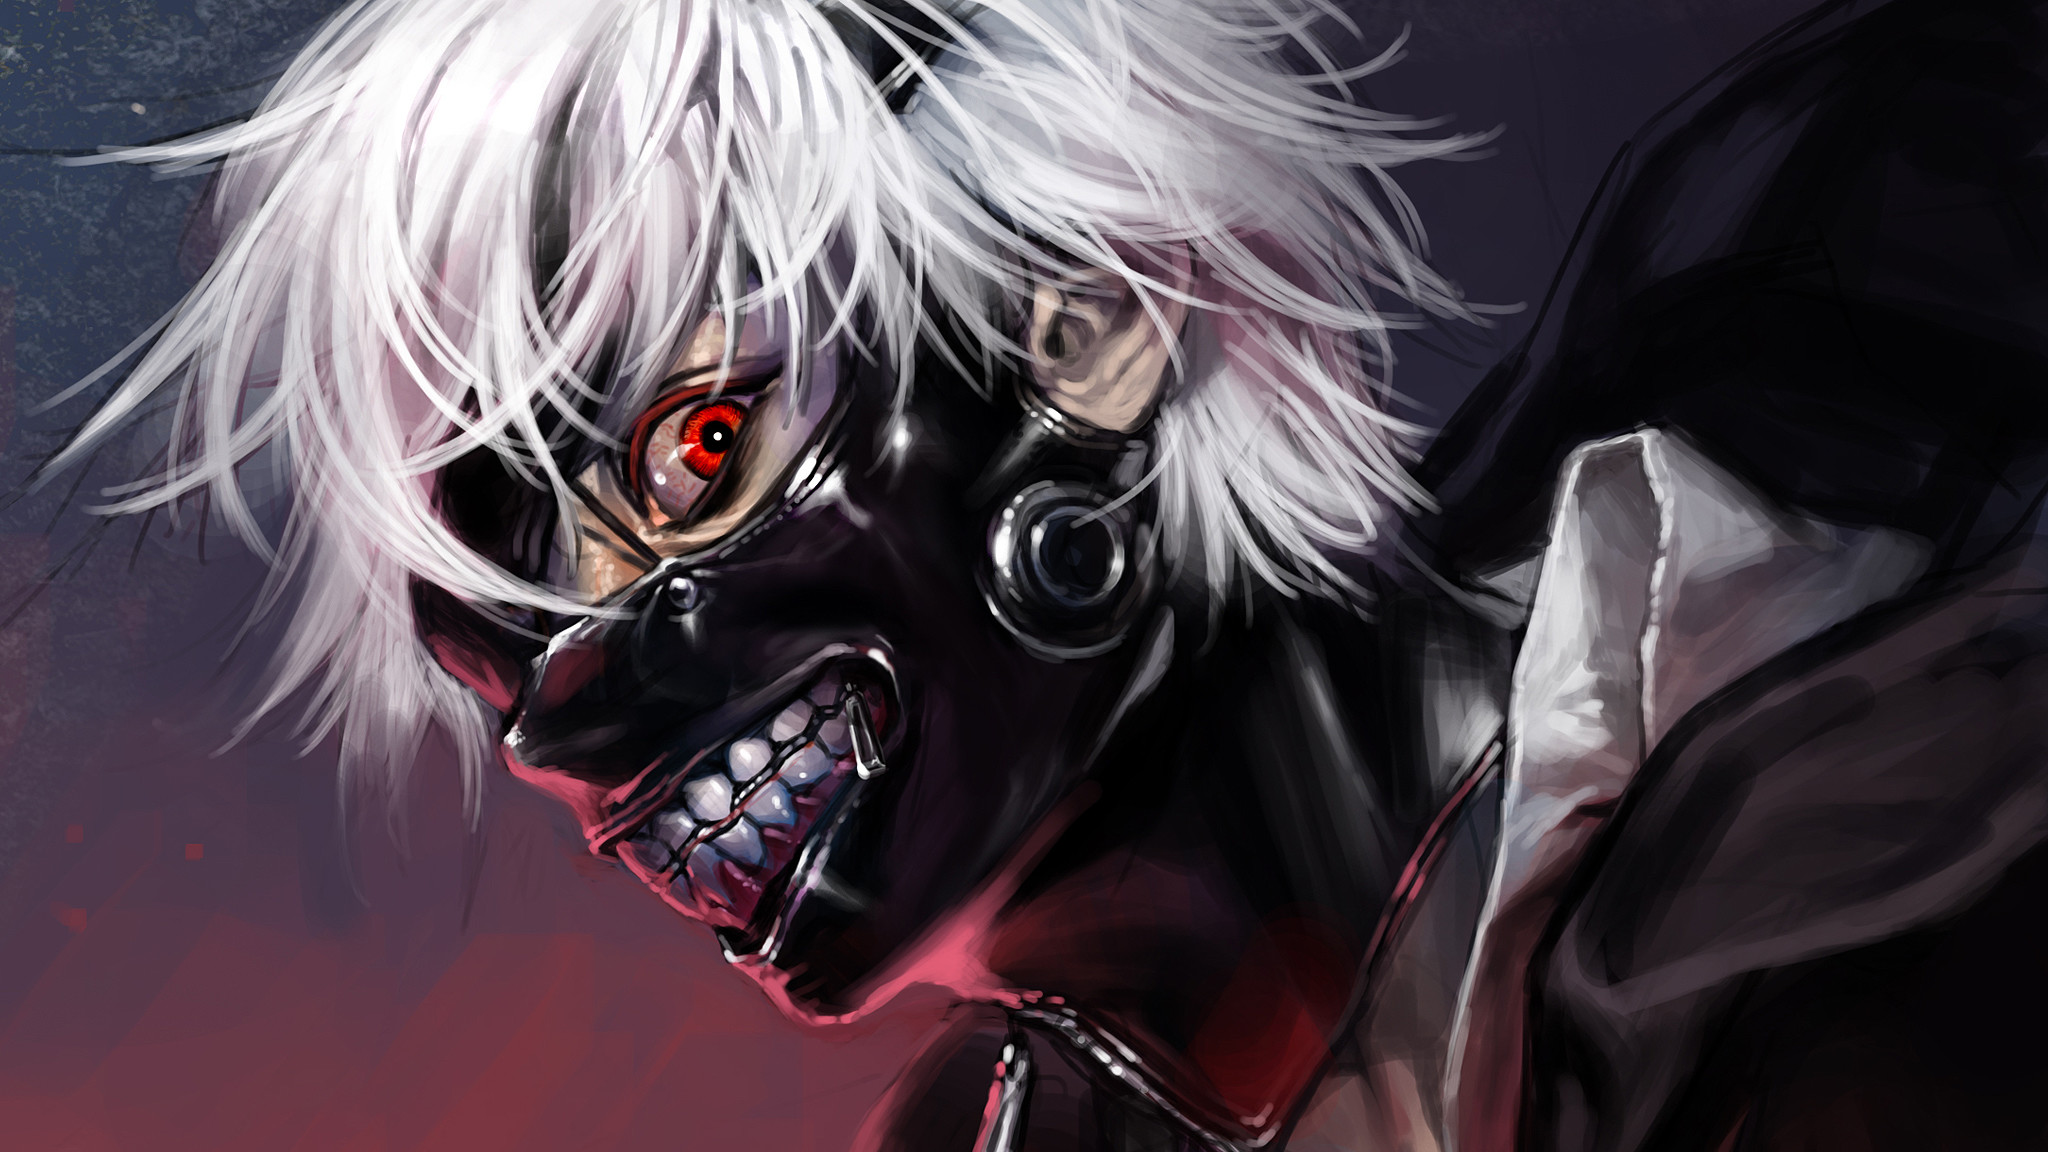 HD Wallpaper | Hintergrund ID:596820. Anime Tokyo Ghoul